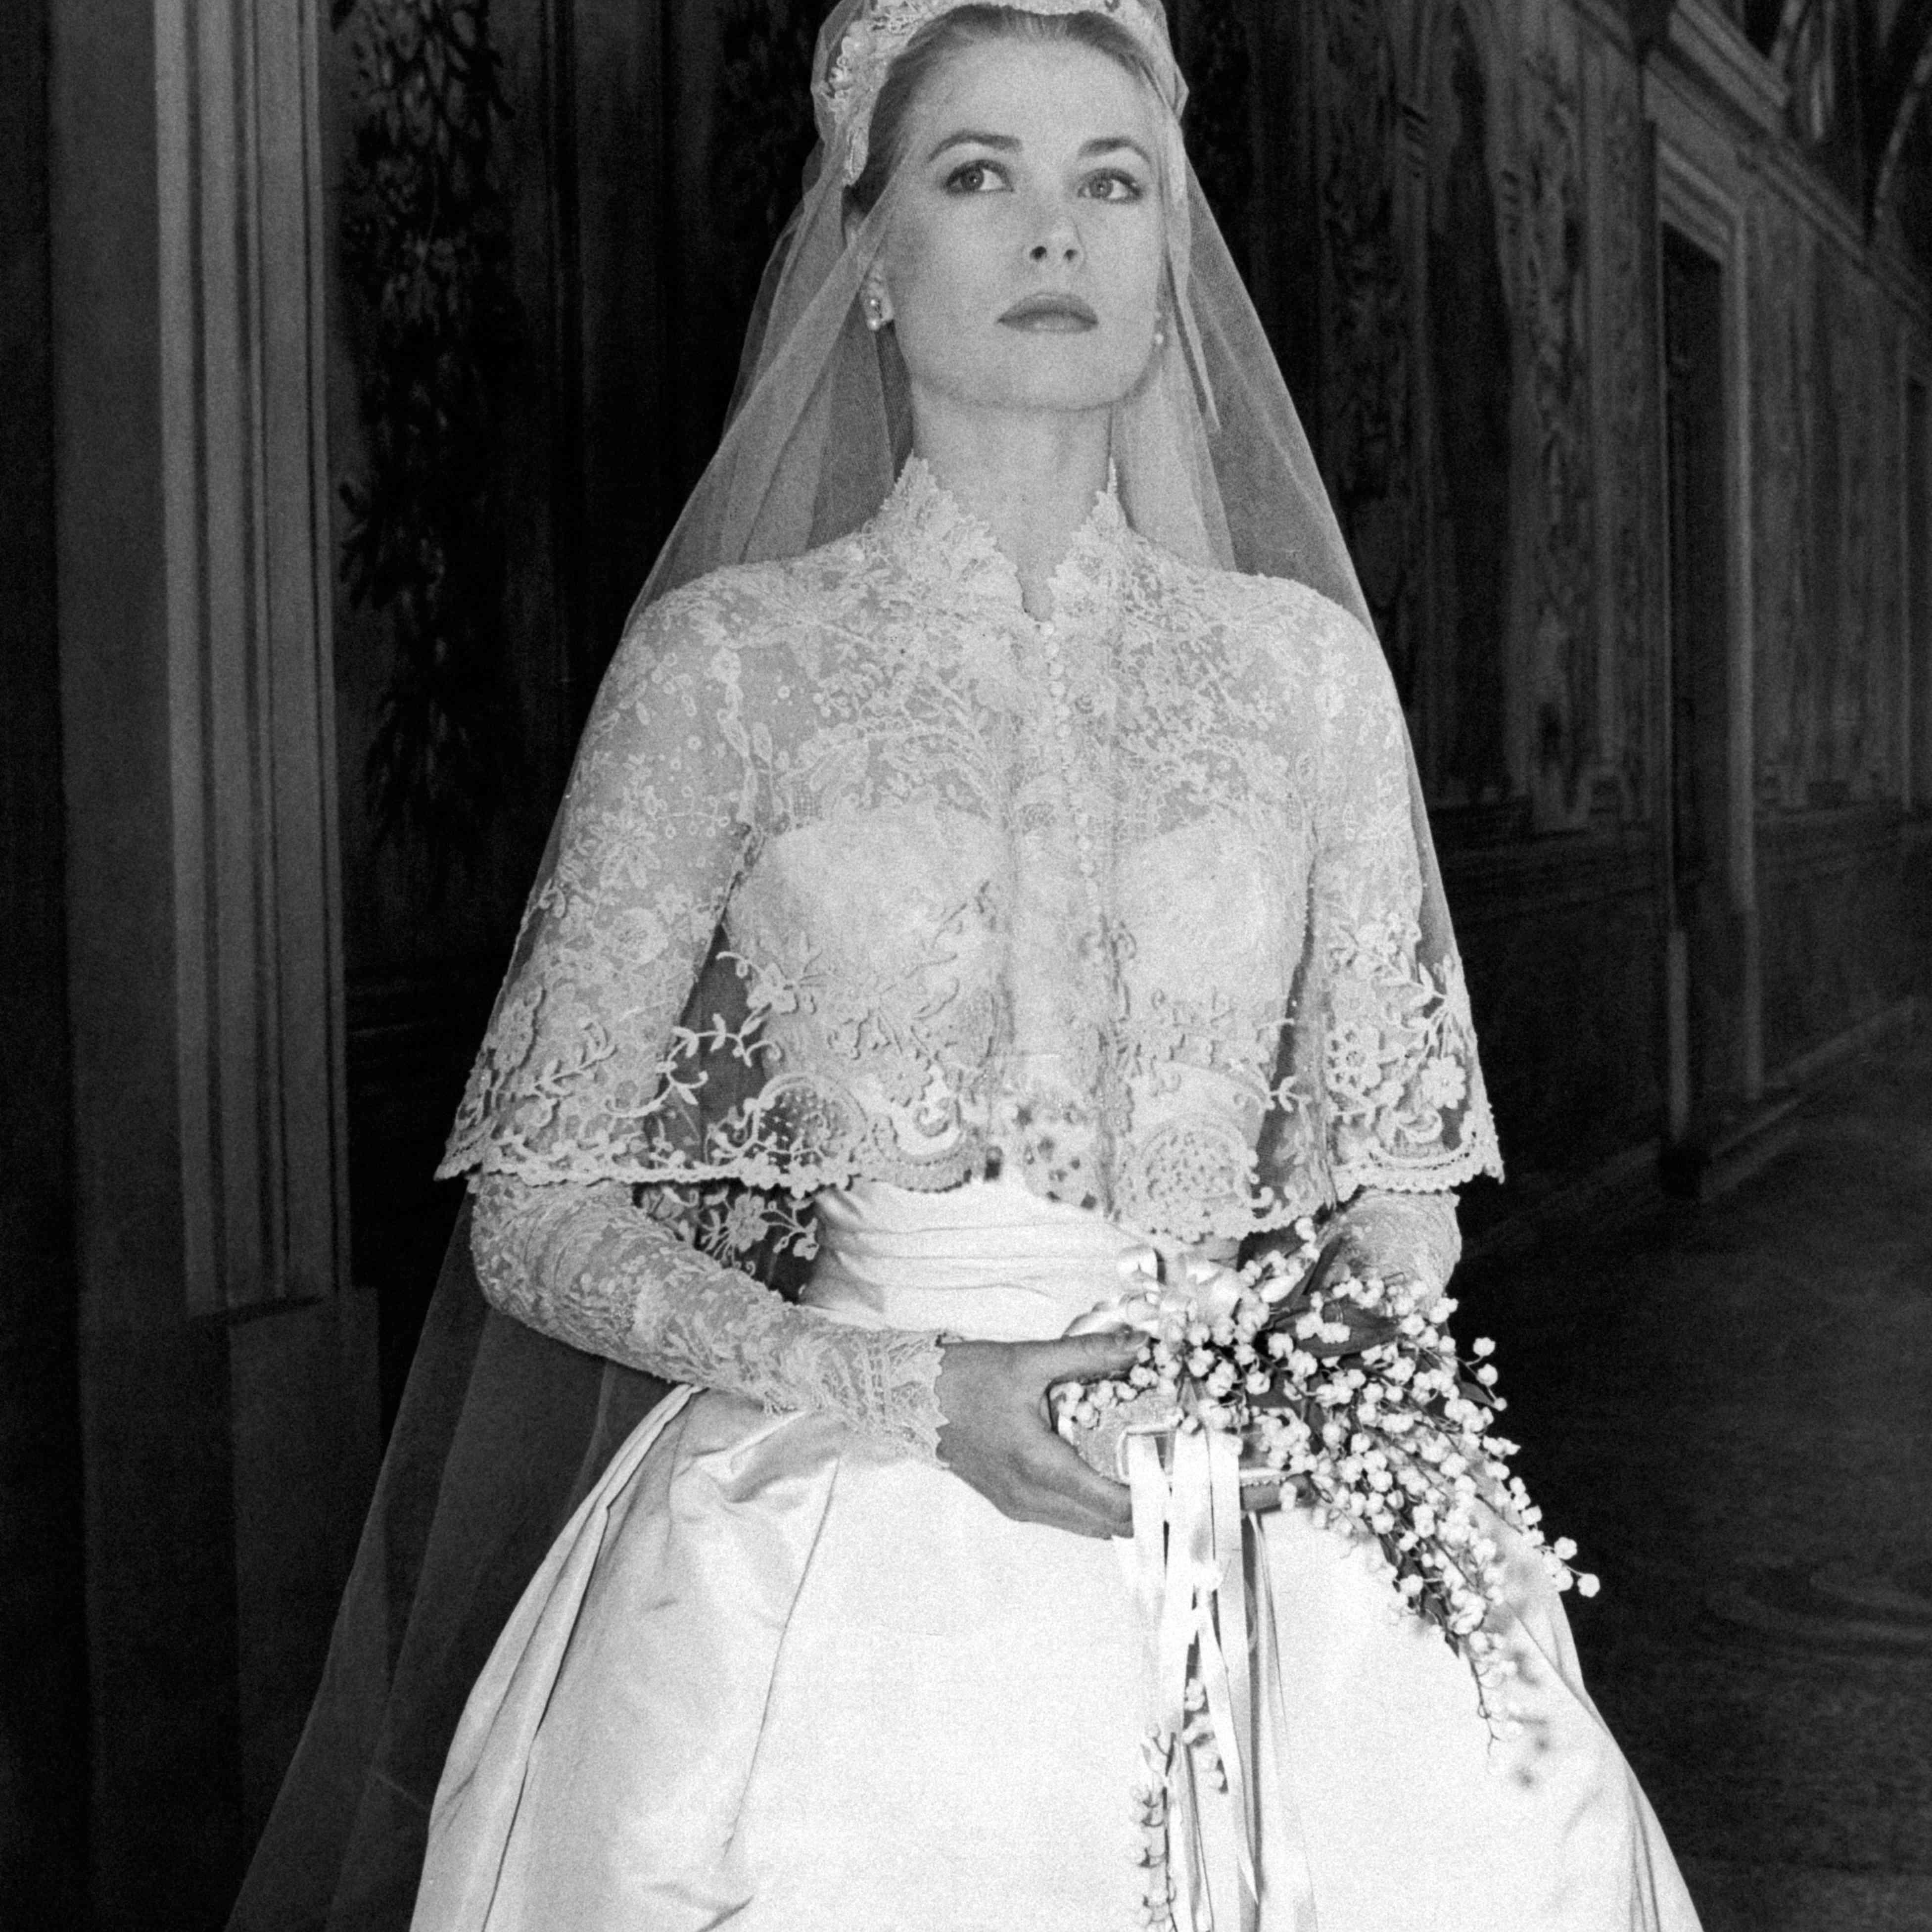 Grace Kelly in wedding dress with bouquet